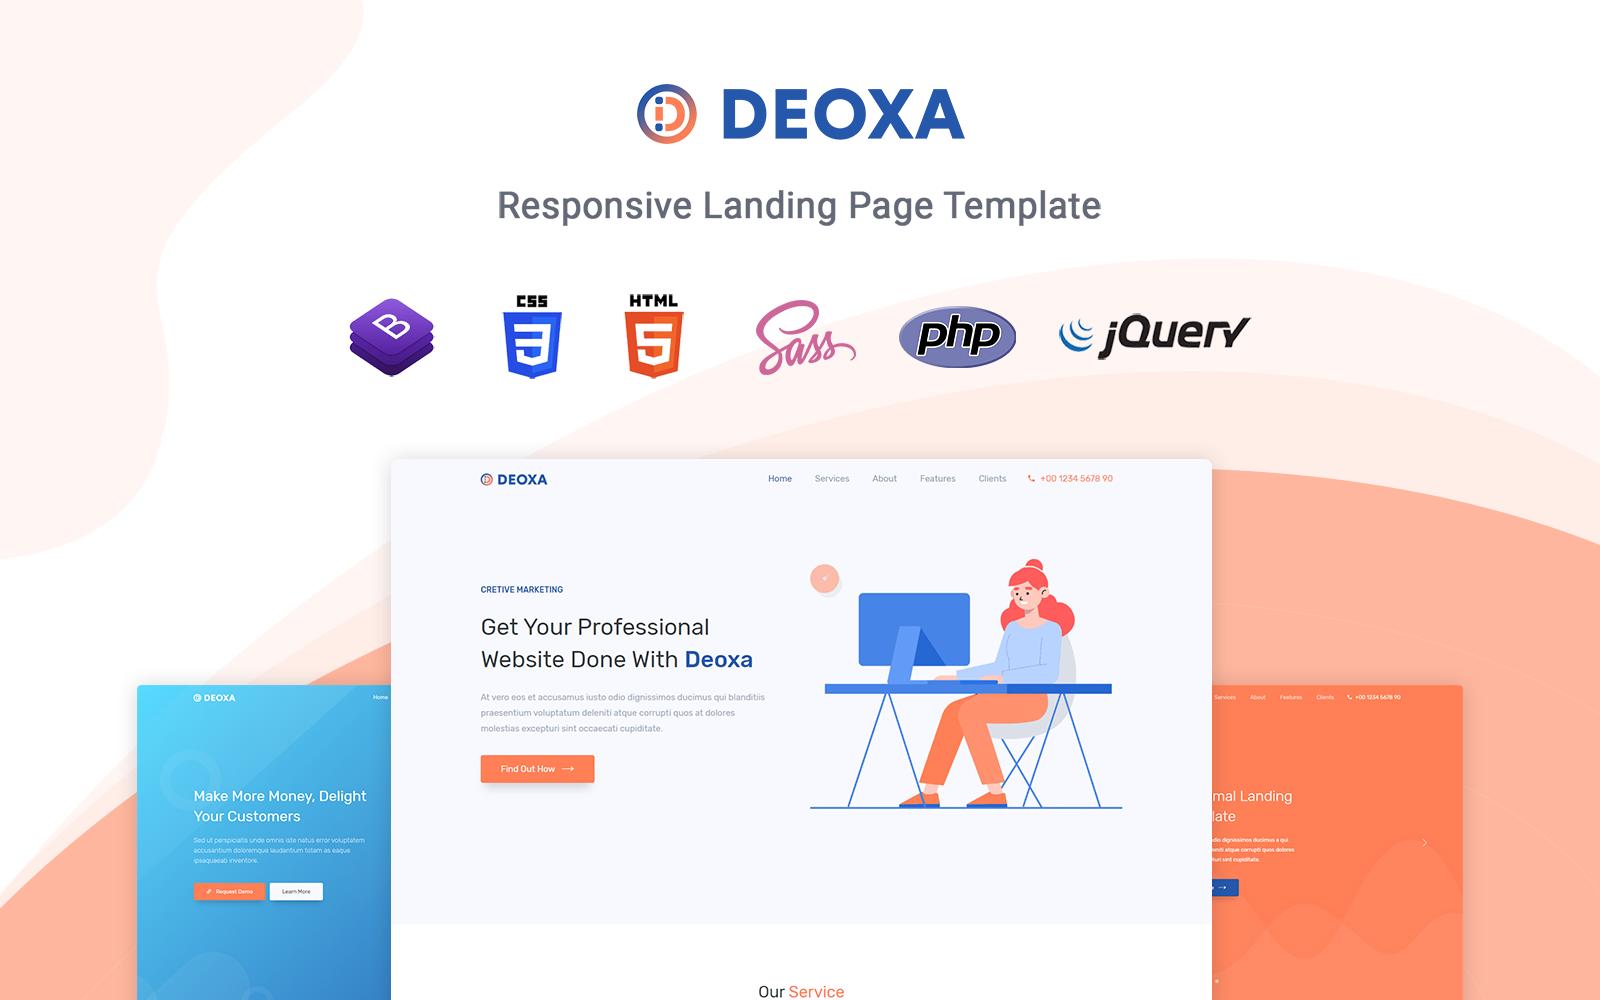 Deoxa - Responsive Landing Page Template